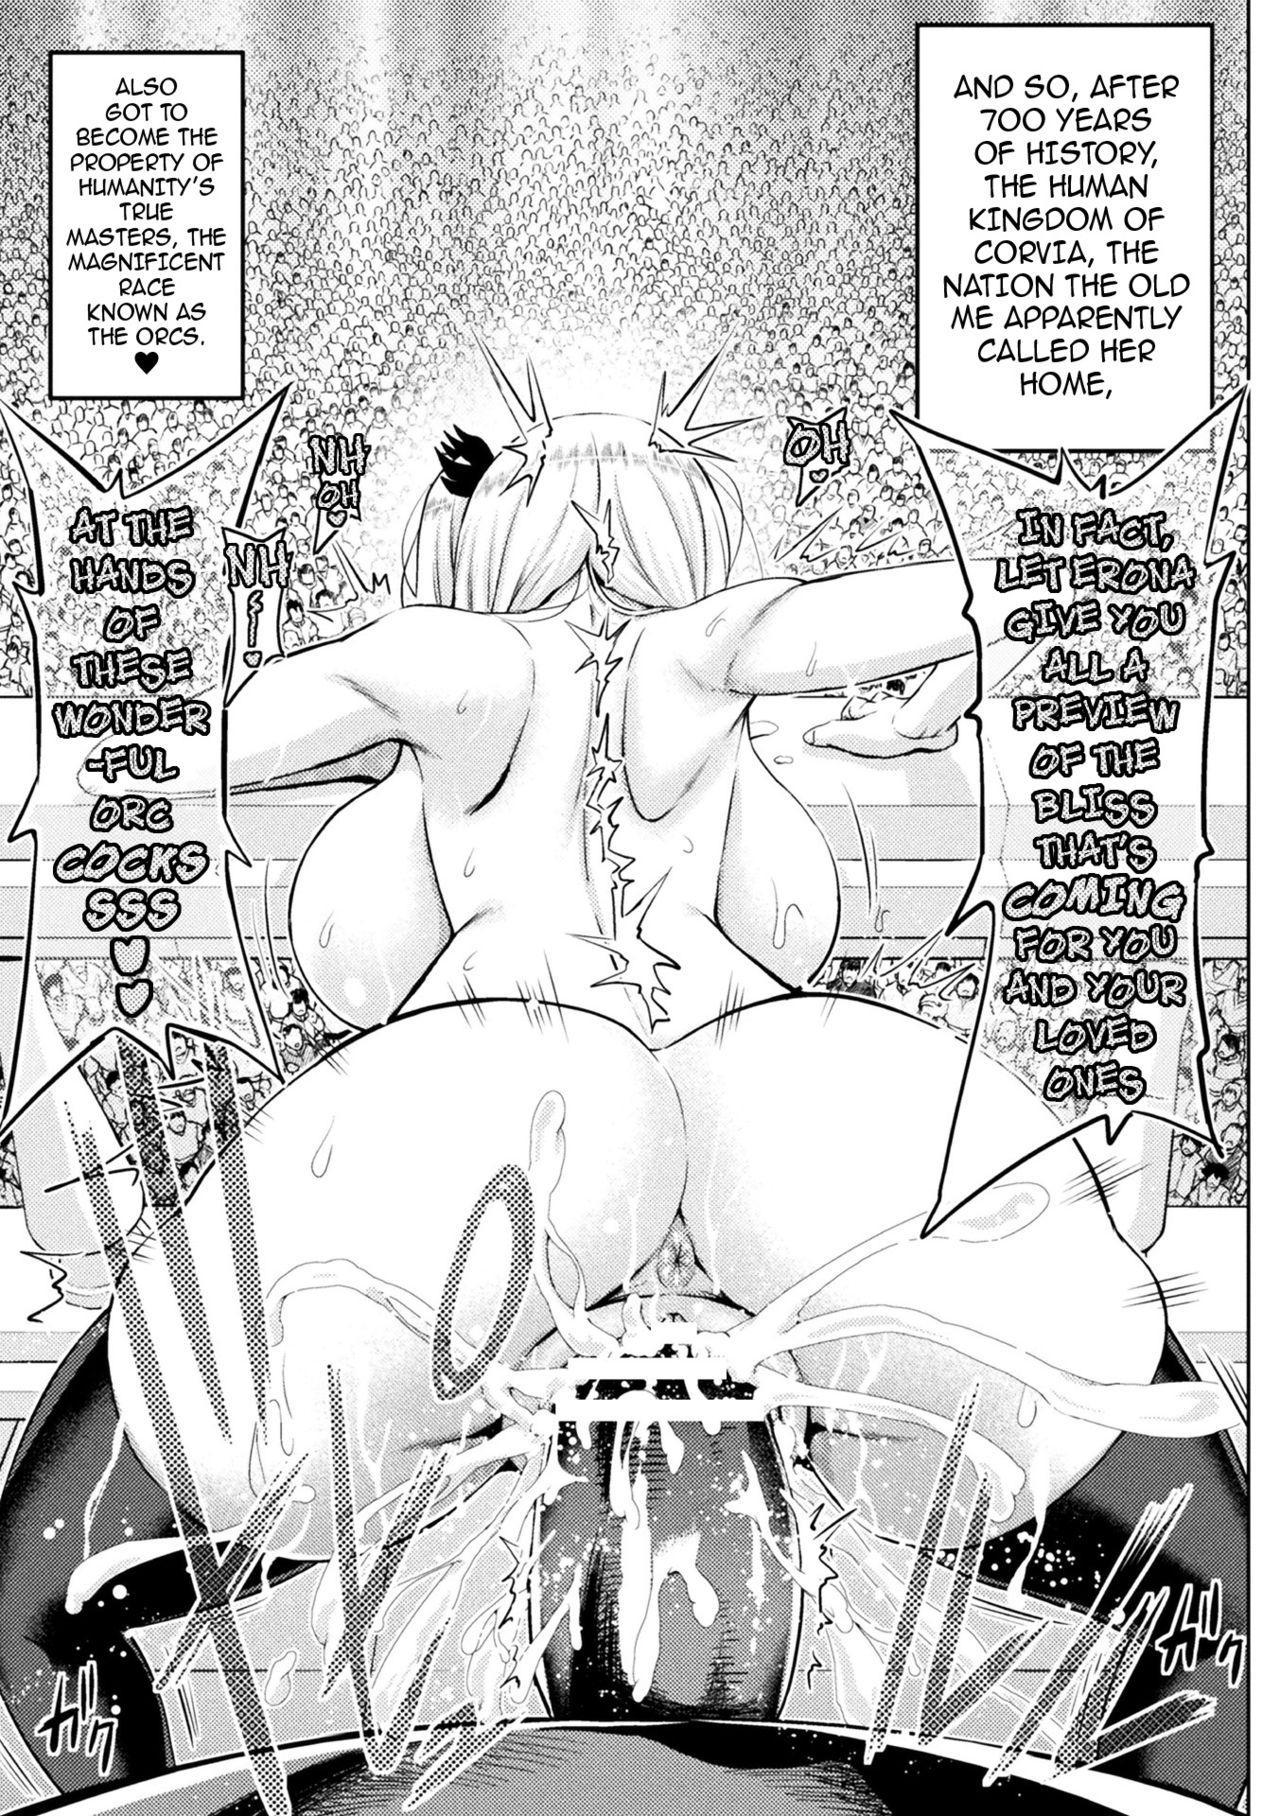 [Yamada Gogogo] Erona ~Orc no Inmon ni Okasareta Onna Kishi no Matsuro~ | Erona ~The Fall of a Beautiful Knight Cursed with the Lewd Mark of an Orc~ [English] {darknight} 103